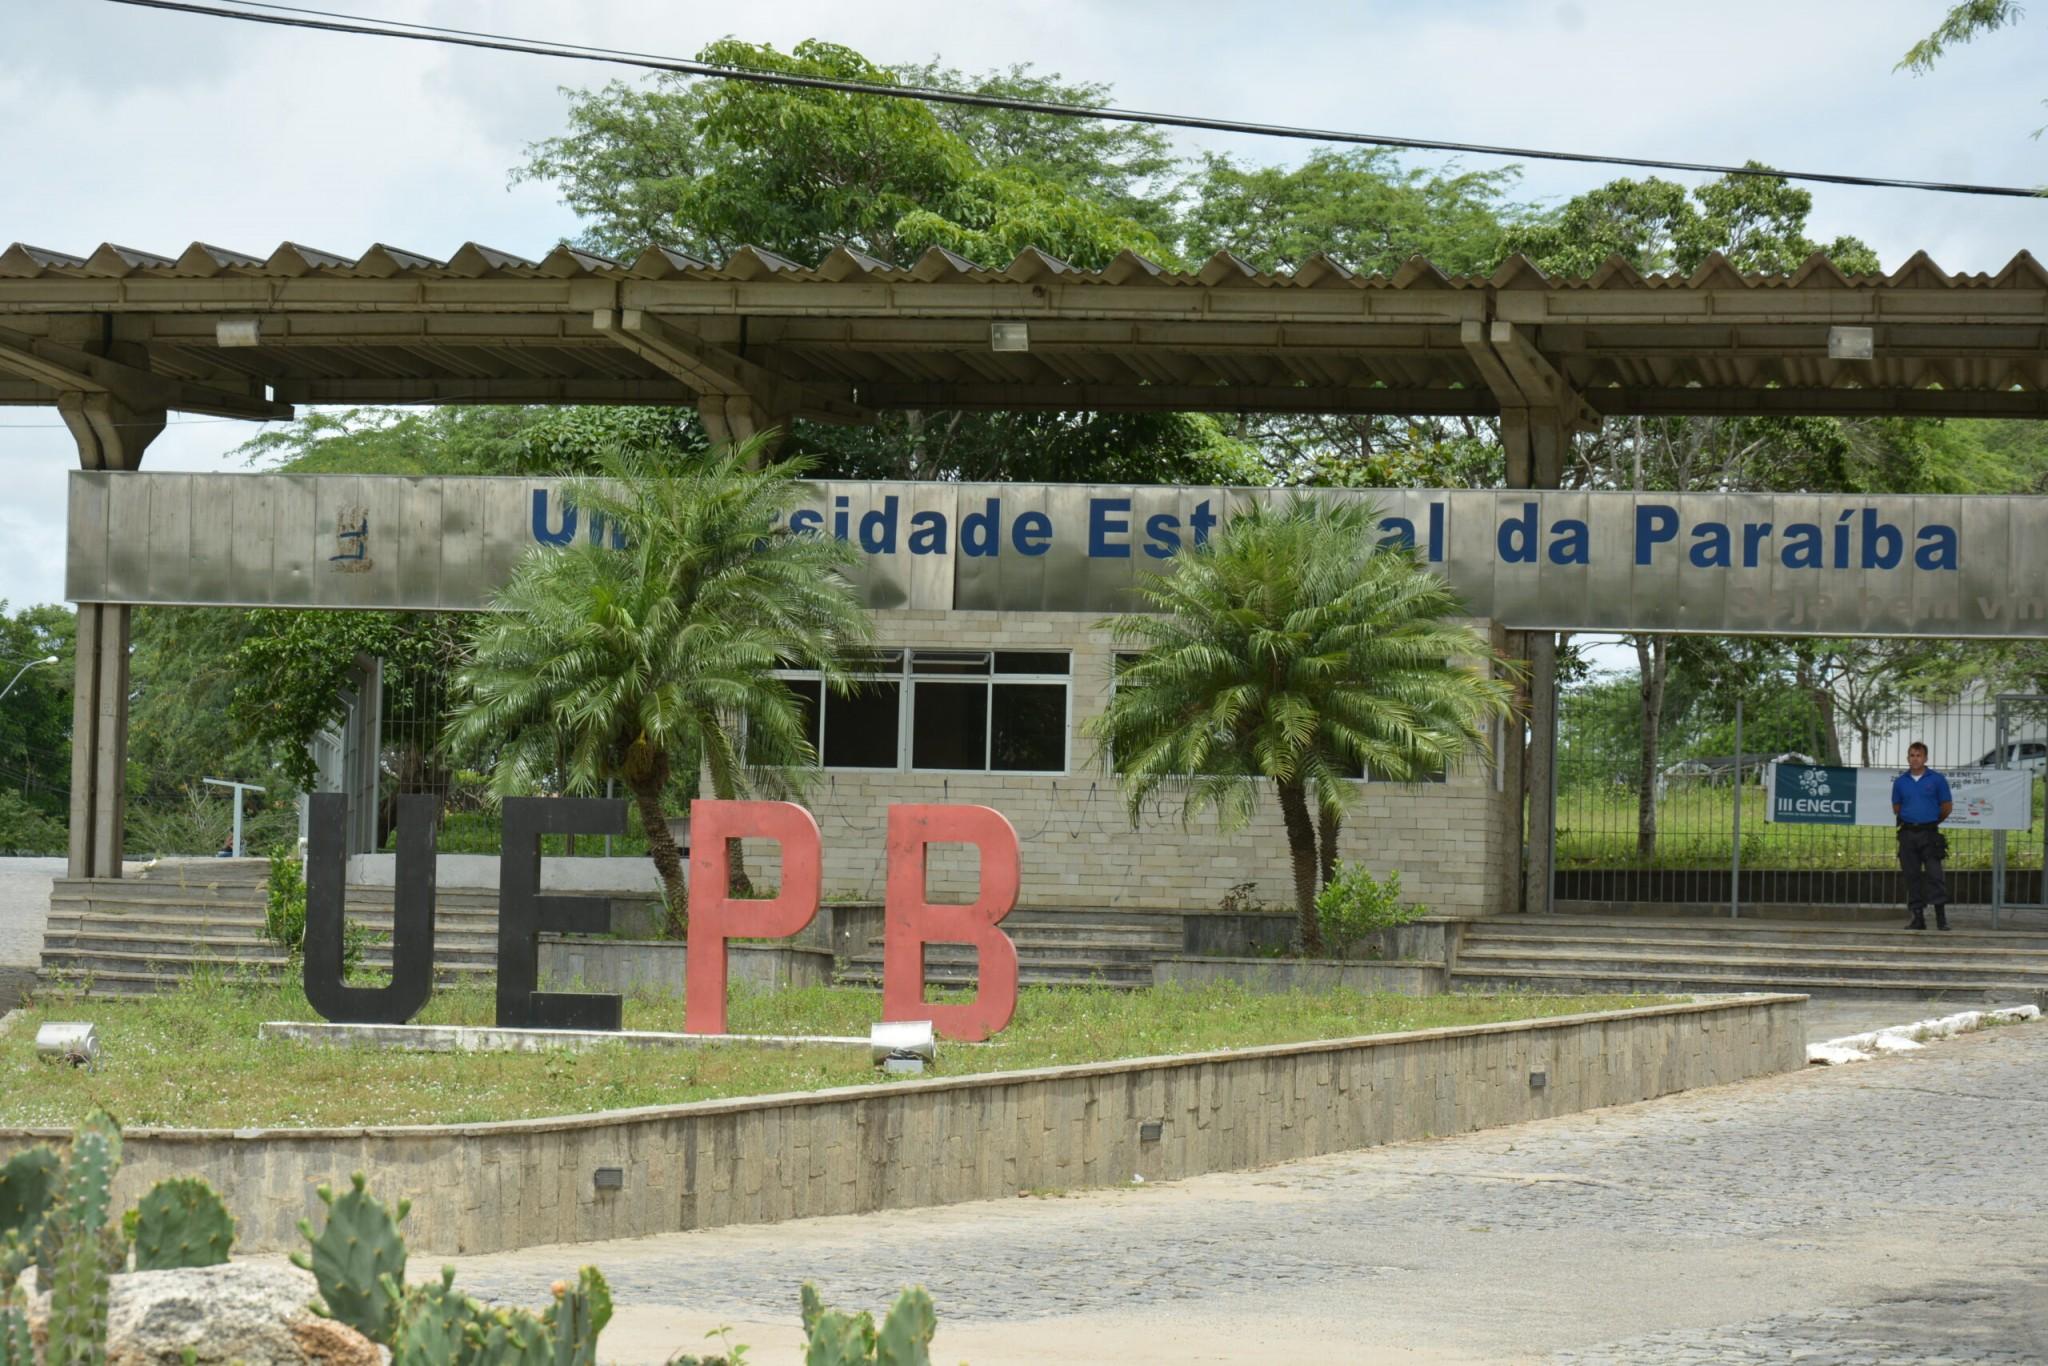 Universidade Estadual da Paraíba (Foto: Acervo/Jornal Correio da Paraíba)